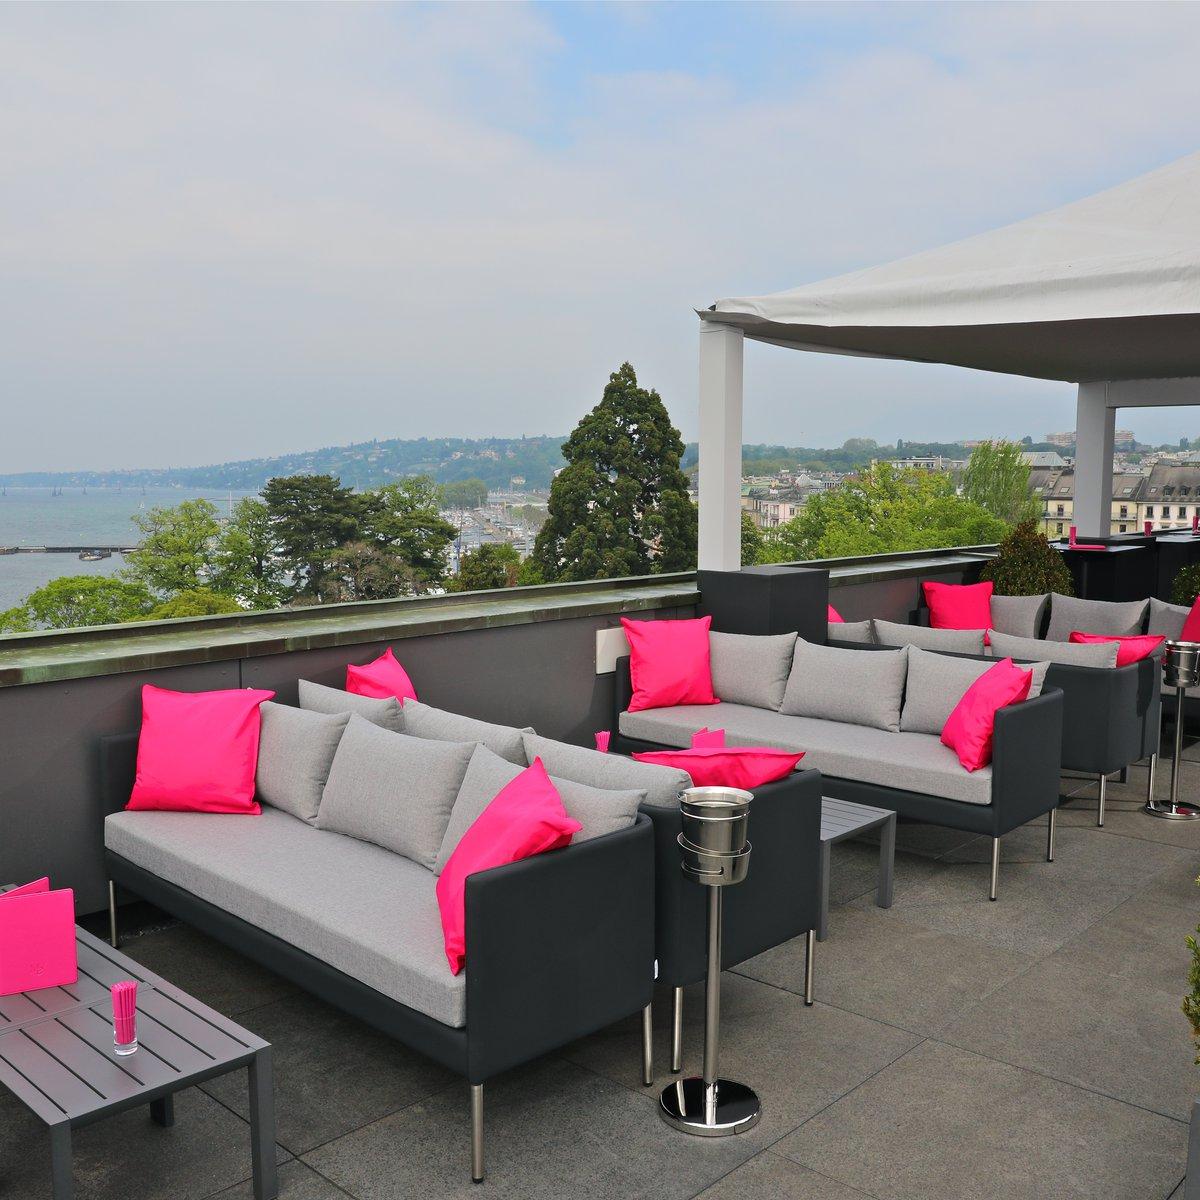 MET Rooftop Lounge